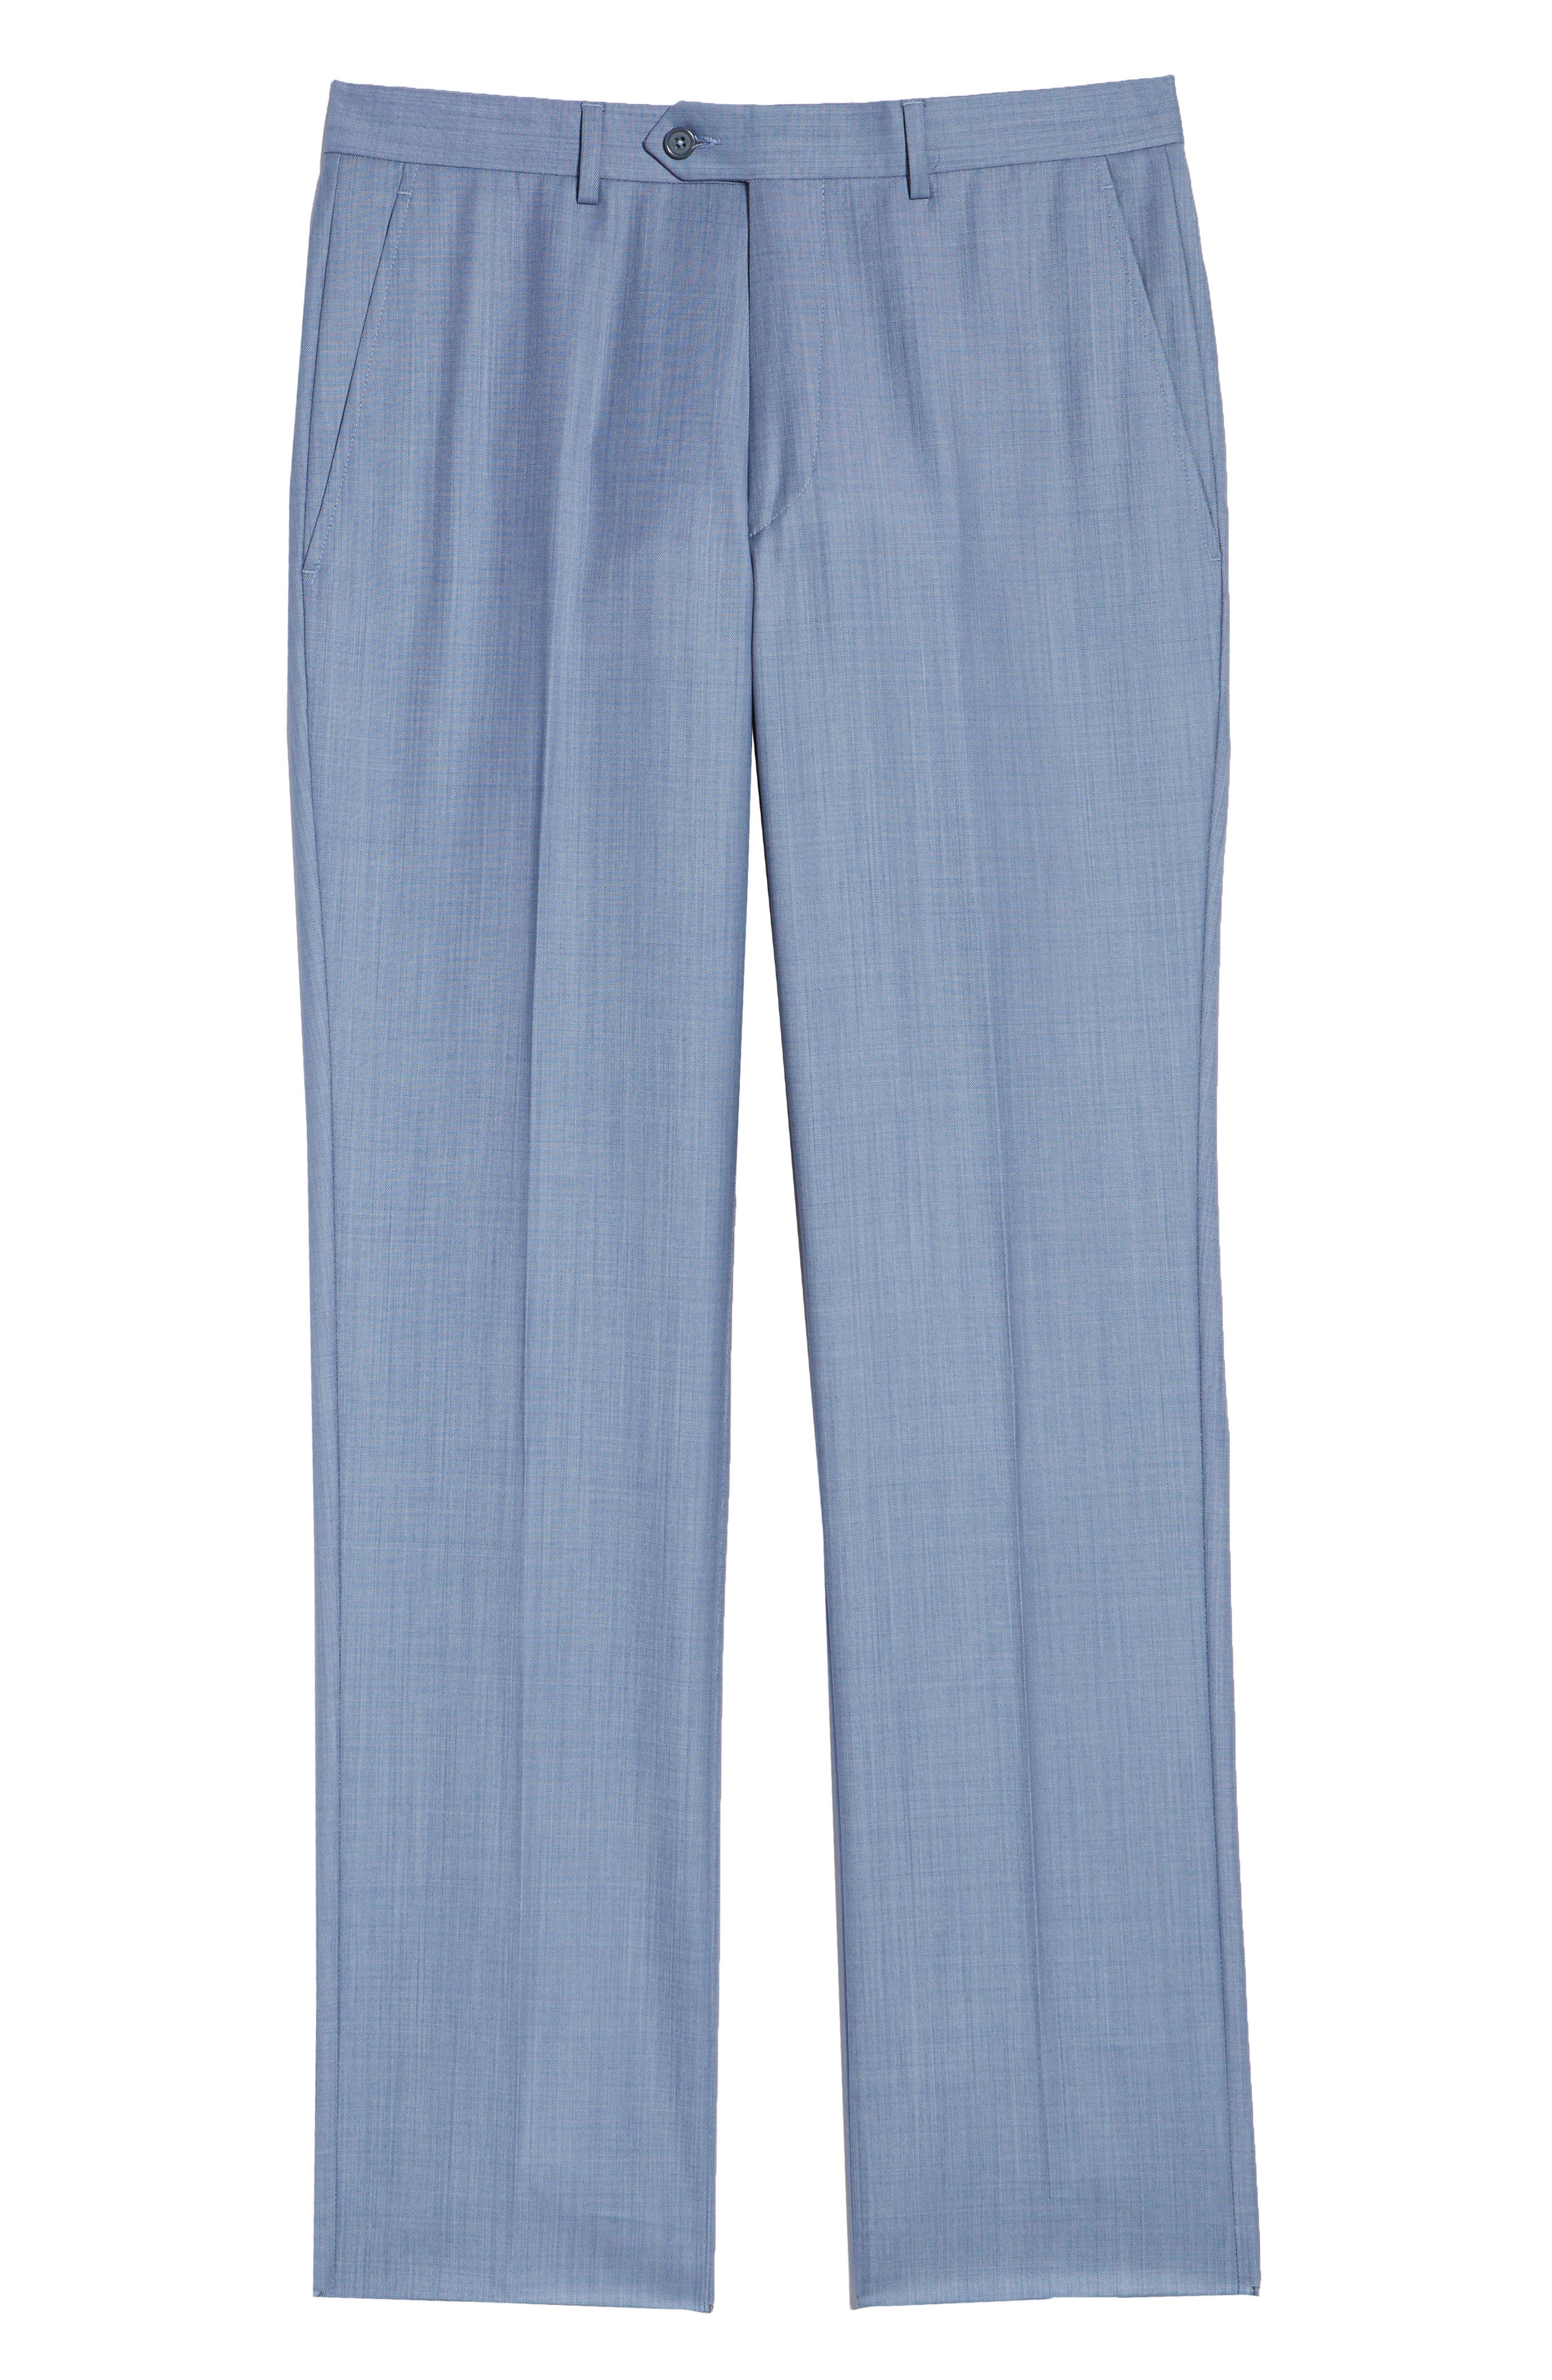 Flat Front Sharkskin Wool Trousers,                             Alternate thumbnail 6, color,                             LIGHT BLUE